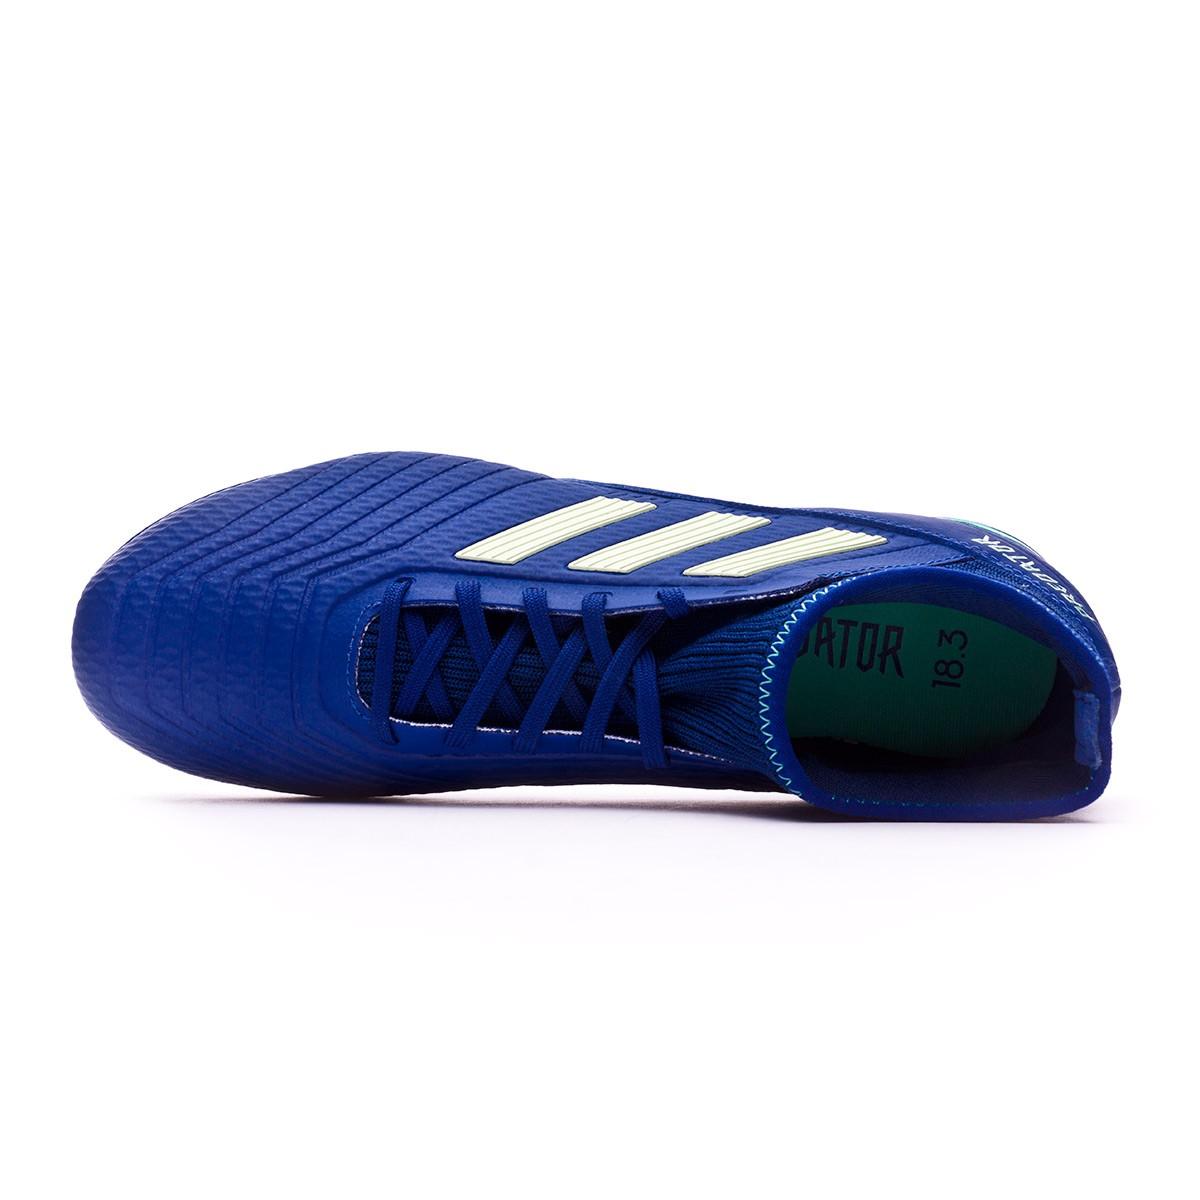 94d31d1f5 Football Boots adidas Predator 18.3 FG Unity ink-Aero green-Hi-res green - Football  store Fútbol Emotion